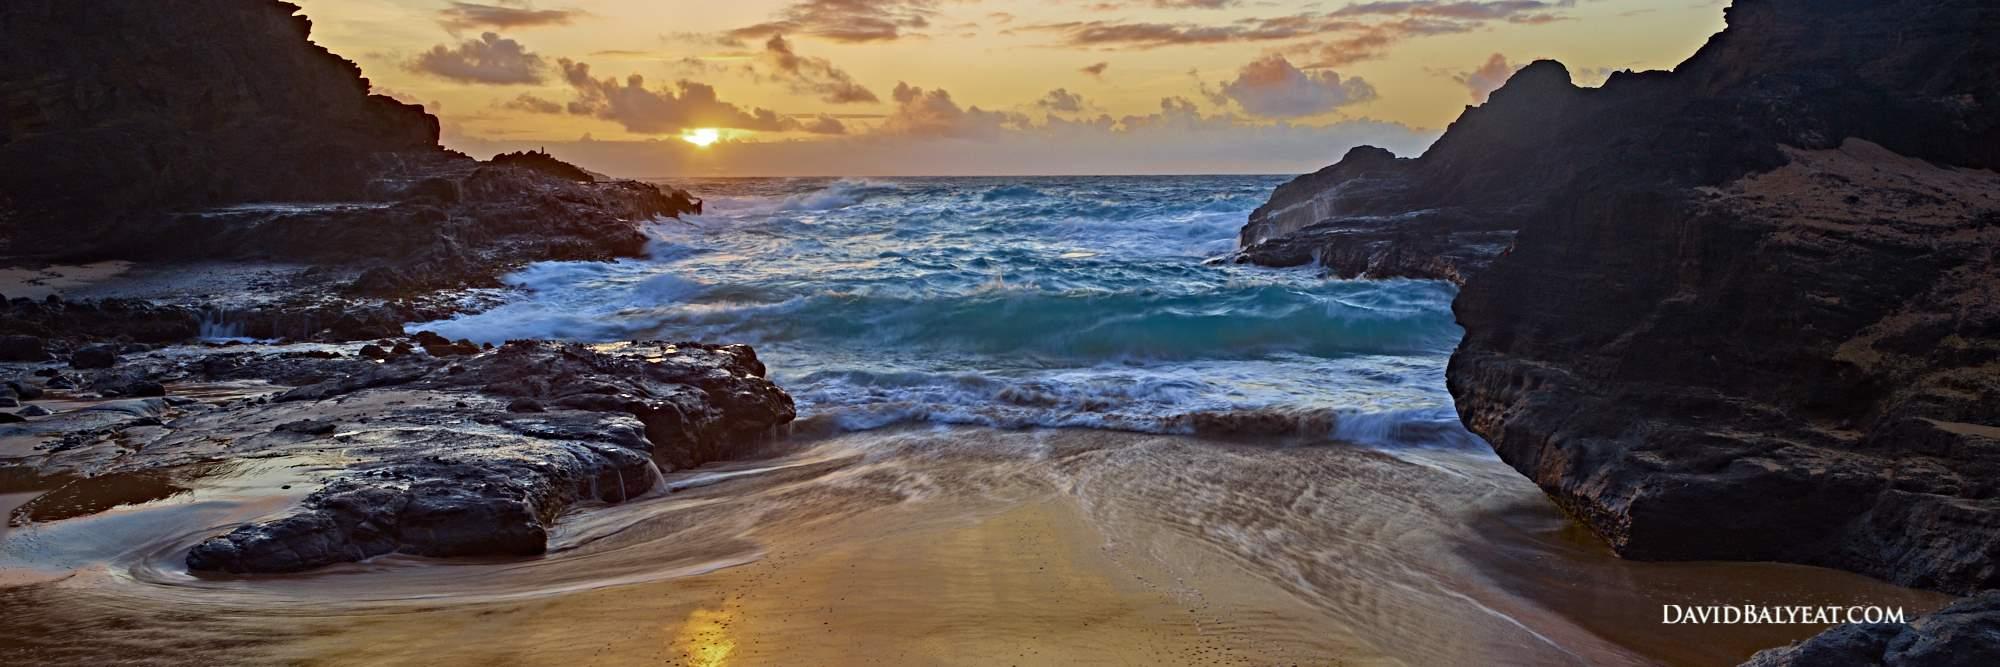 Hawaii sunrise panoramic beach ocean high definition HD professional landscape photography